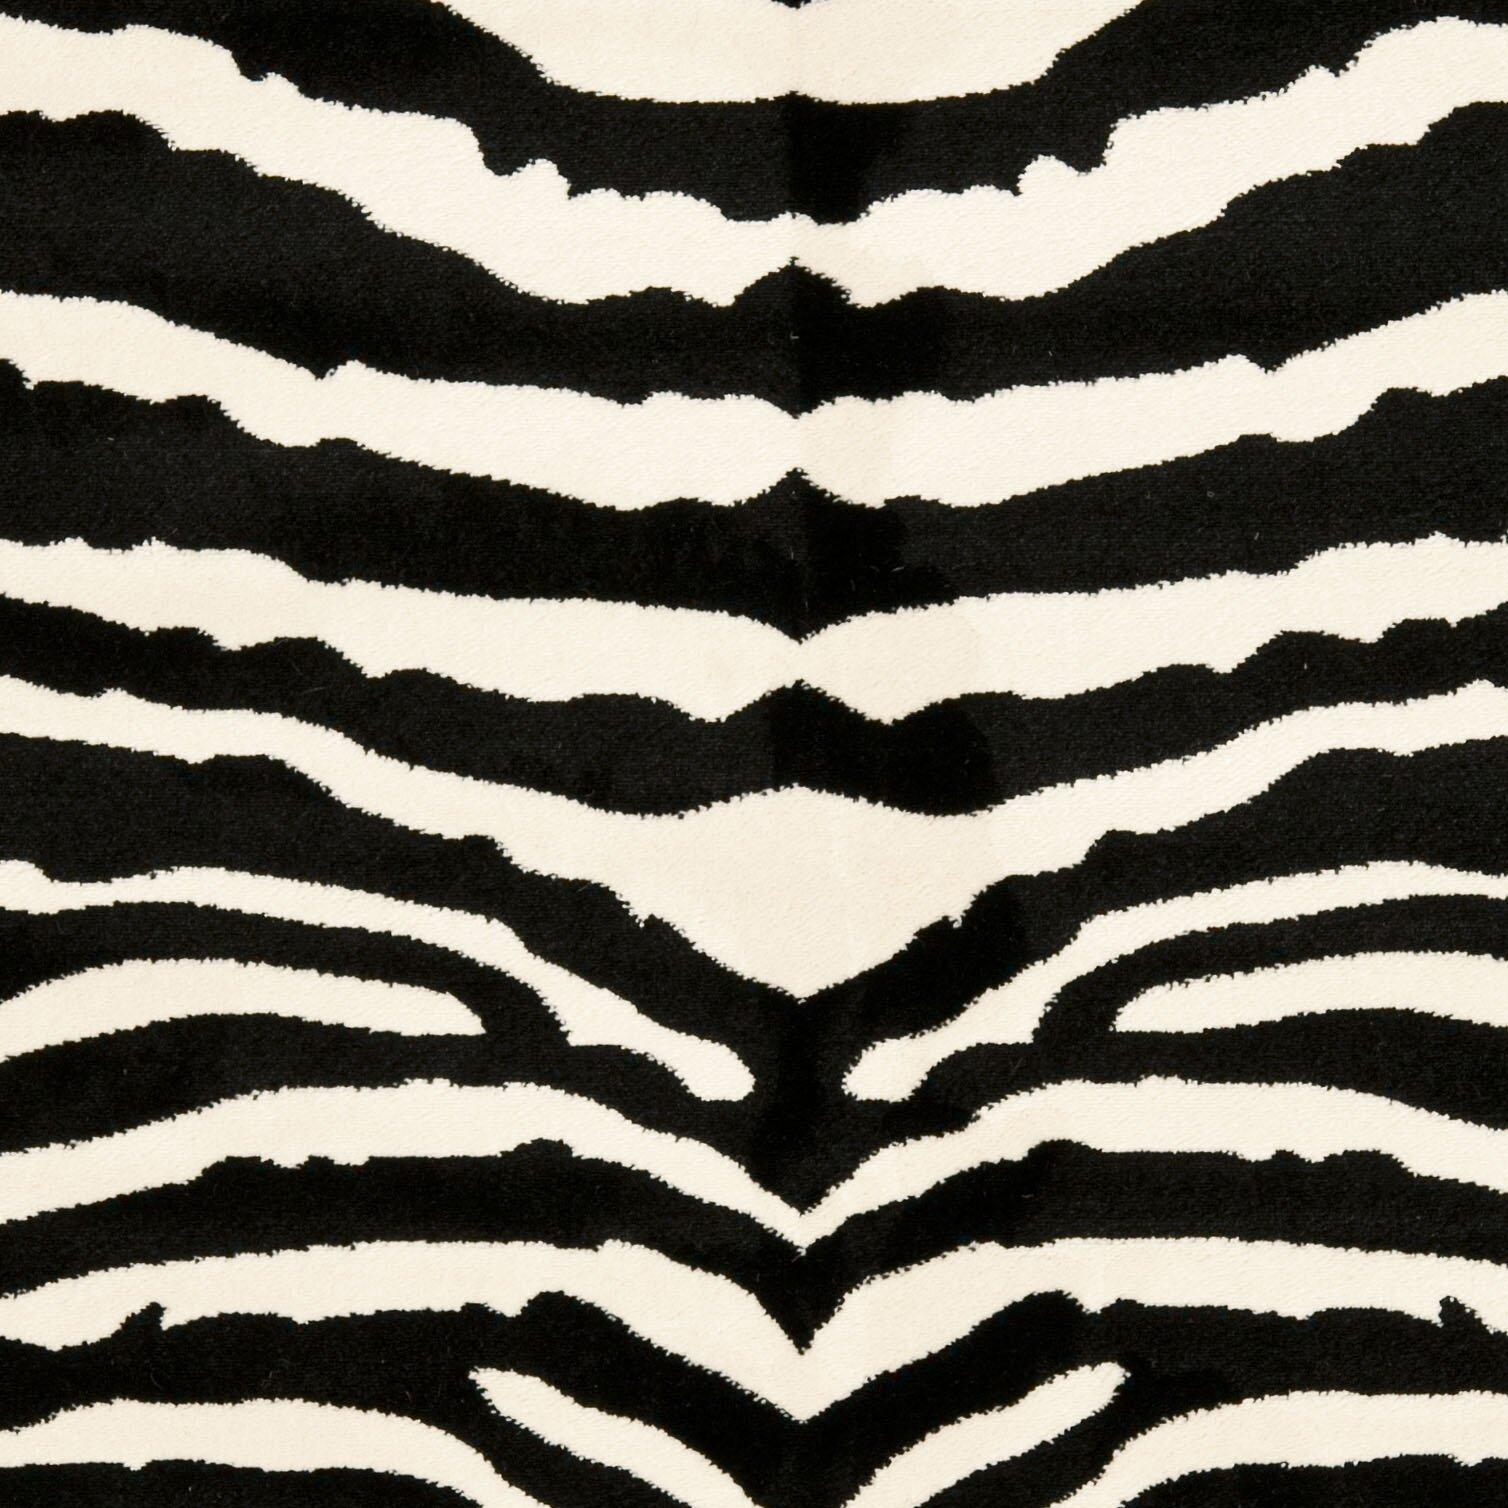 Animal Print Rug Wayfair: Safavieh Lyndhurst Cream/Black Area Rug & Reviews